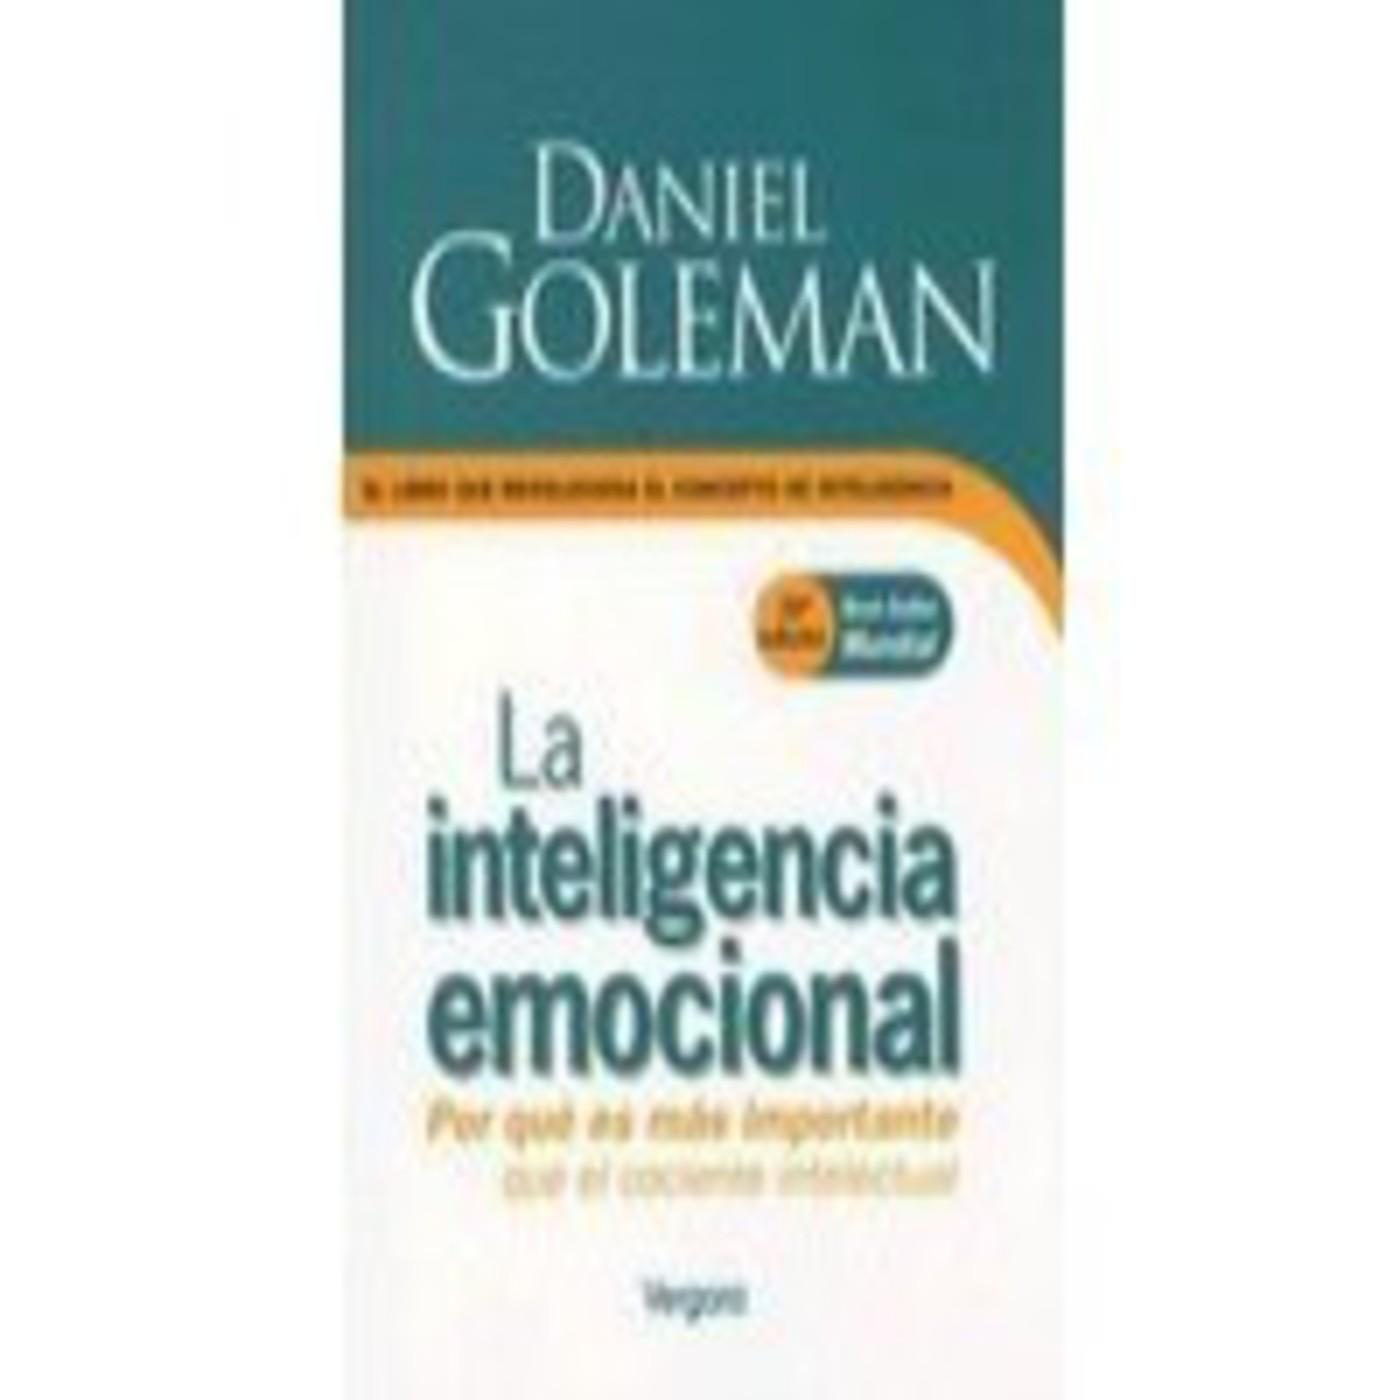 34..INTELIGENCIA EMOCIONAL, Daniel Goleman